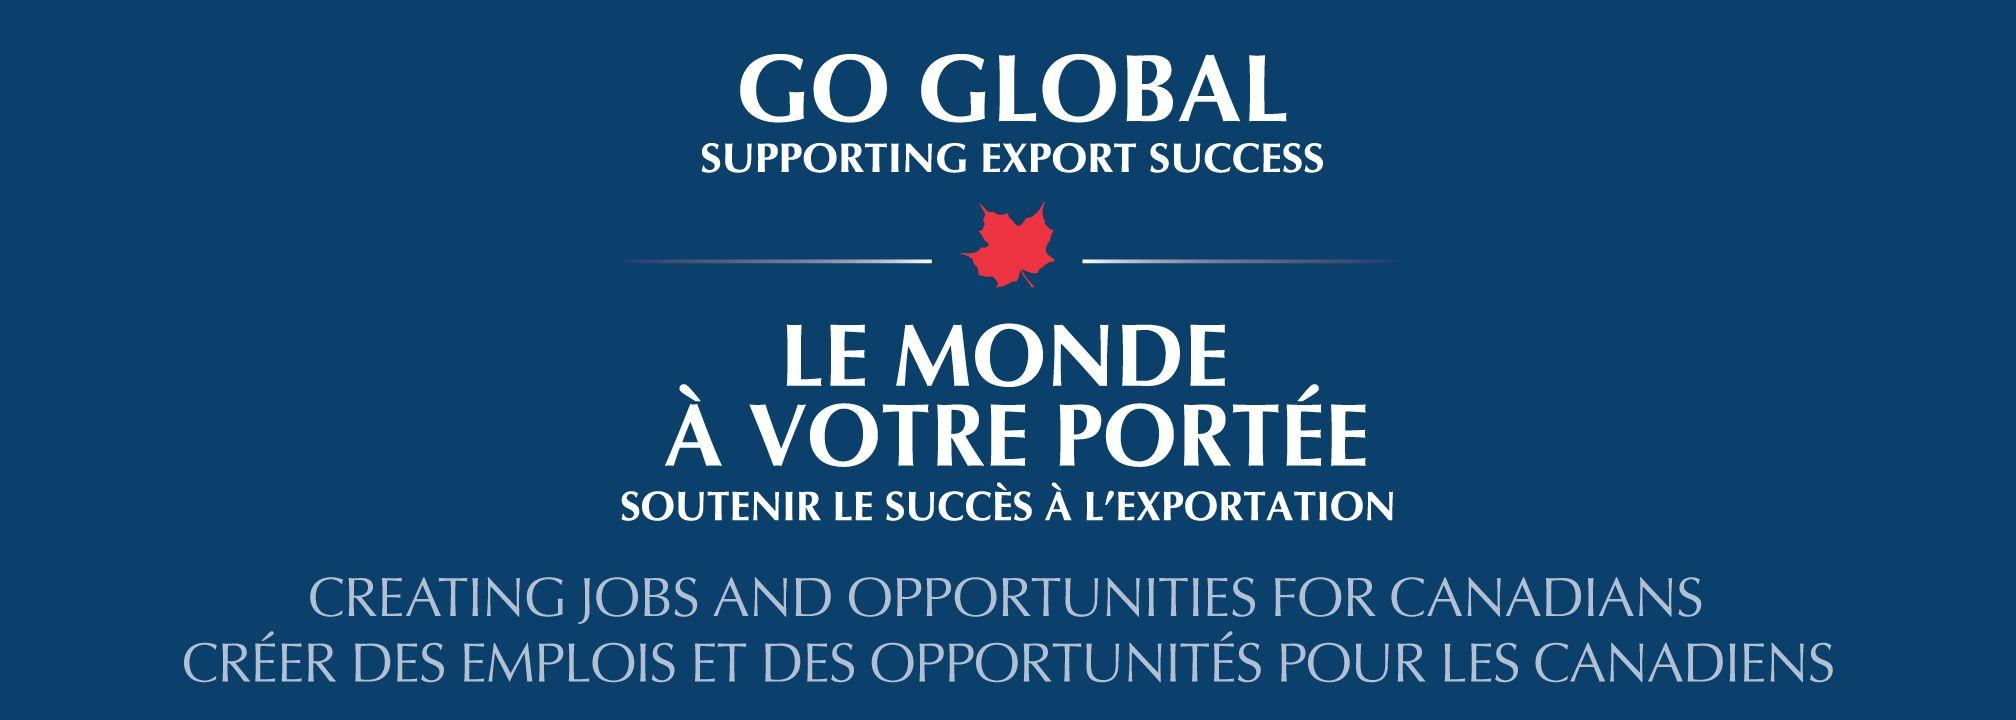 Go Global Supporting Export Success Oceansadvance Inc